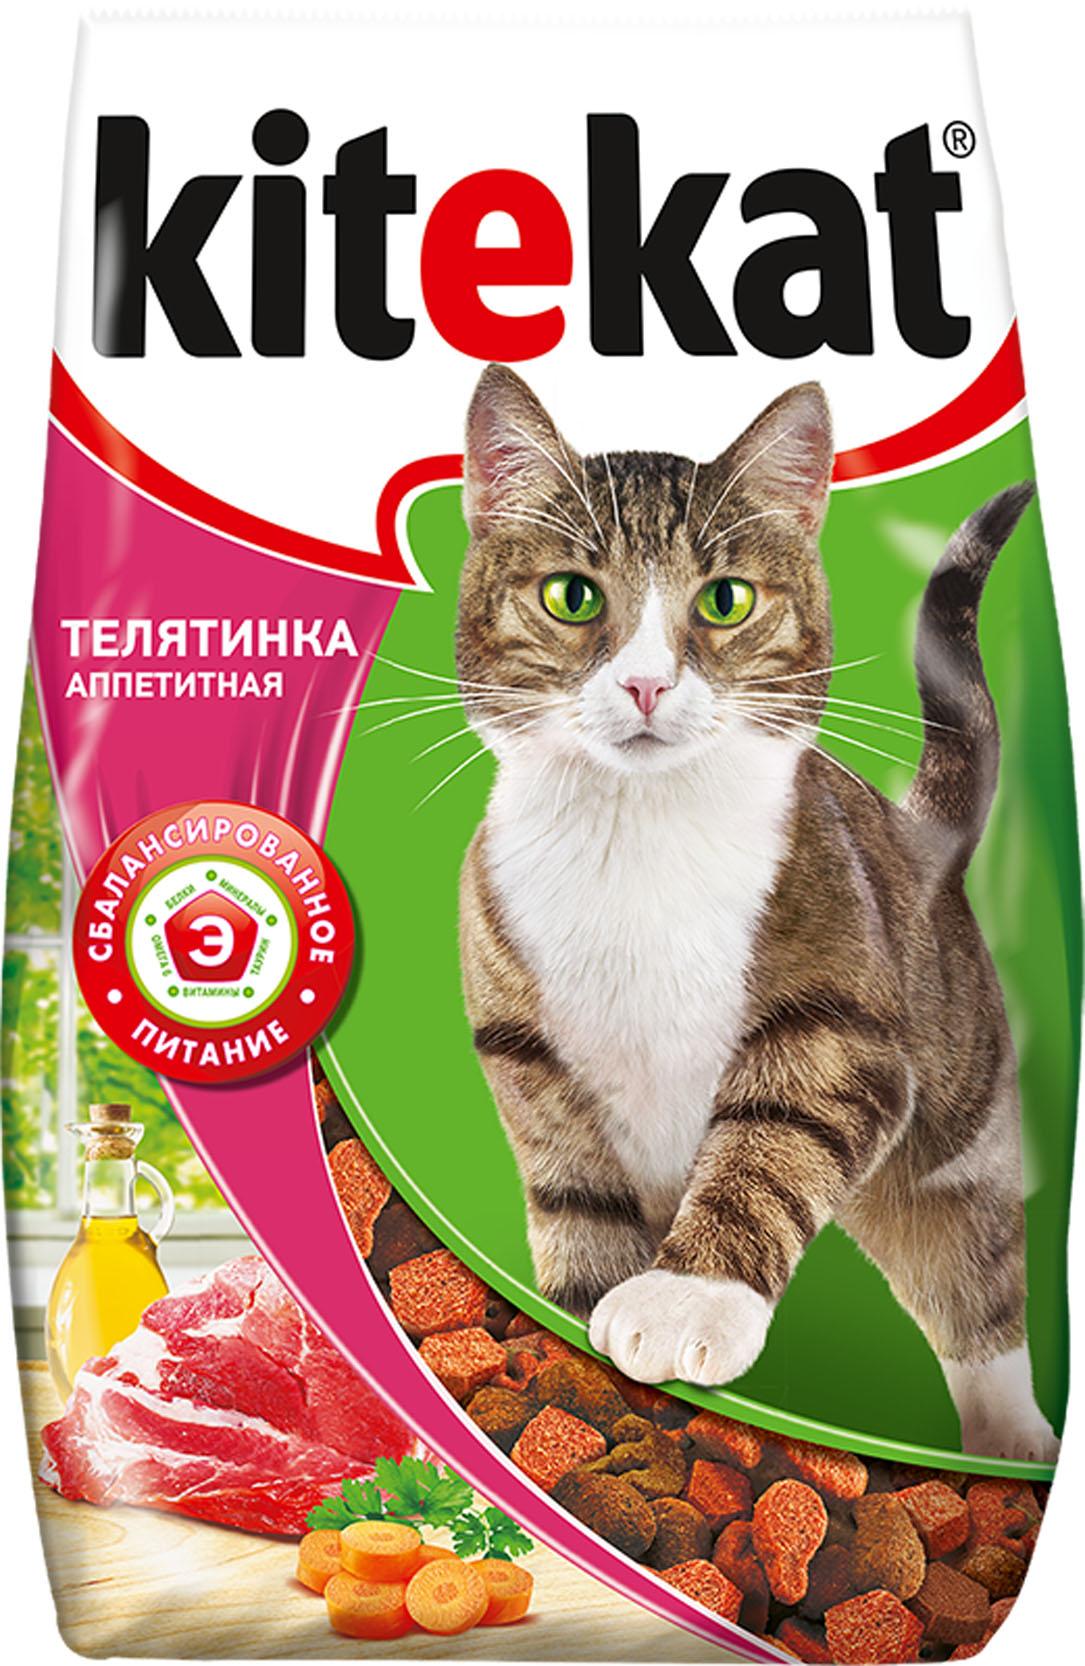 Корм сухой для взрослых кошек Kitekat, телятина аппетитная, 1,9 кг40434